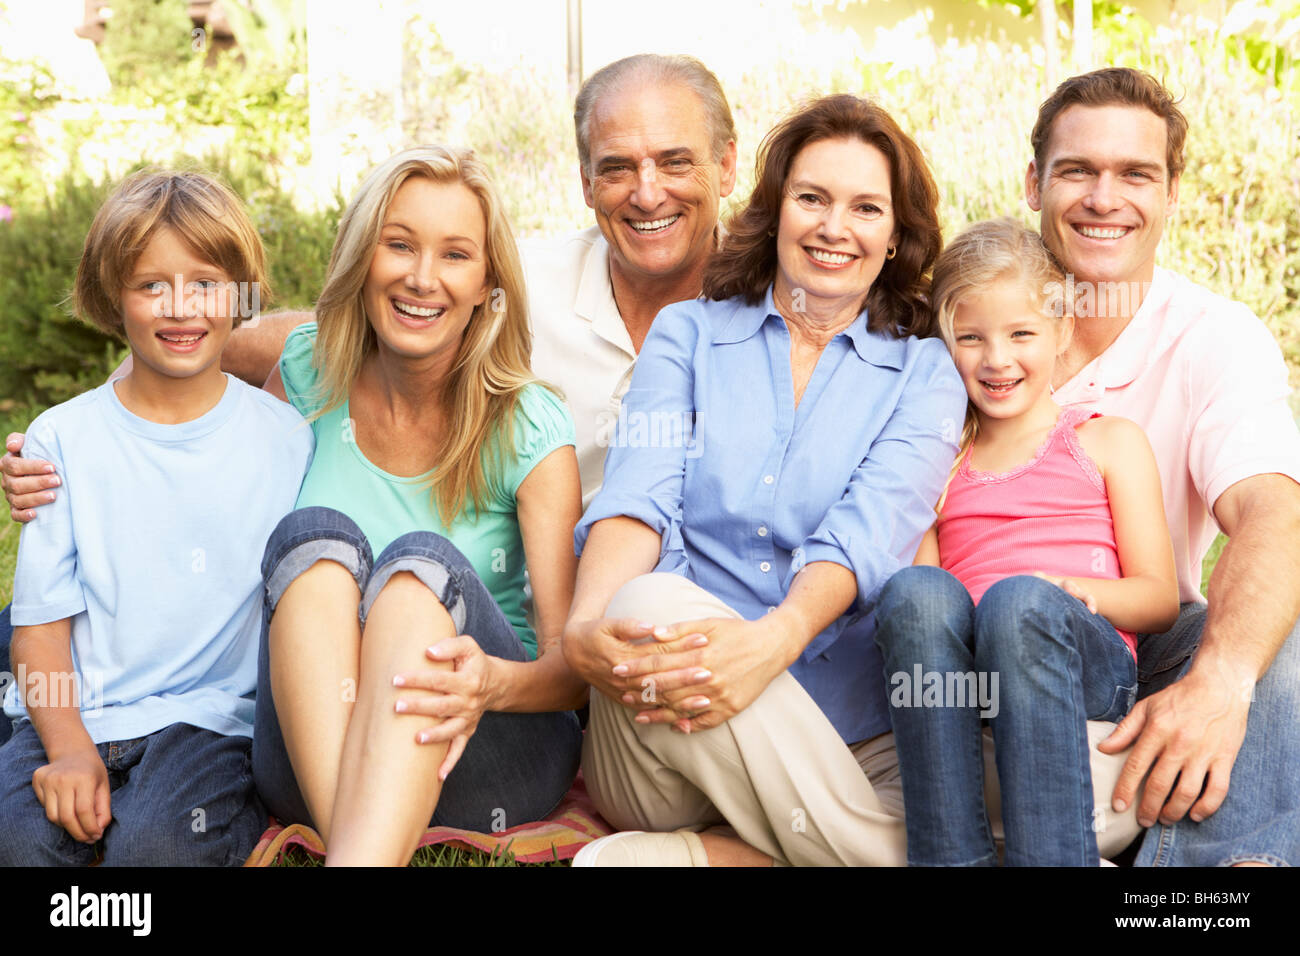 Extended Group Portrait Of Family In Garden - Stock Image